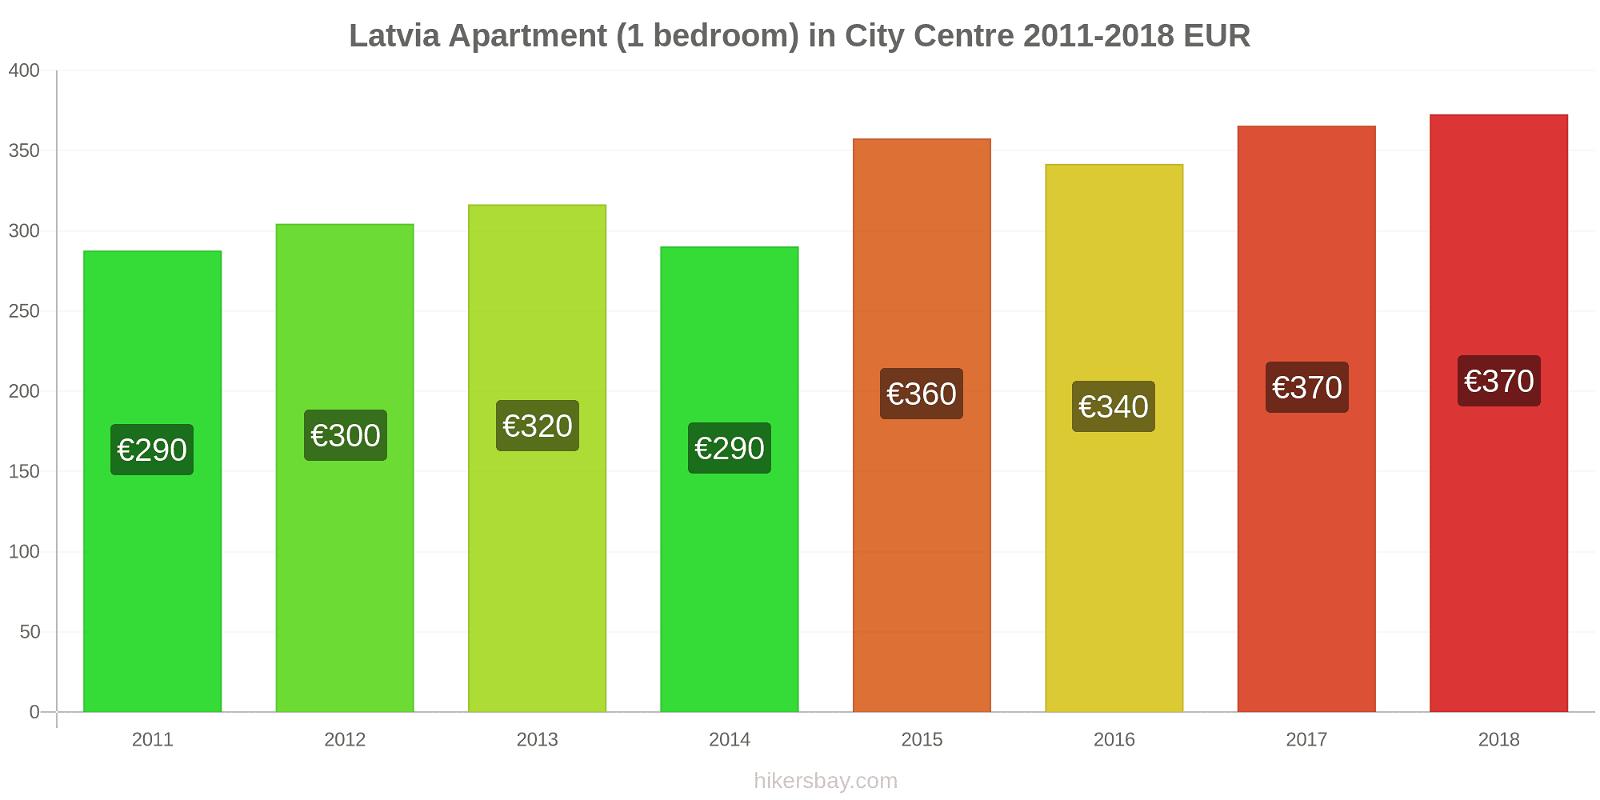 Latvia price changes Apartment (1 bedroom) in City Centre hikersbay.com